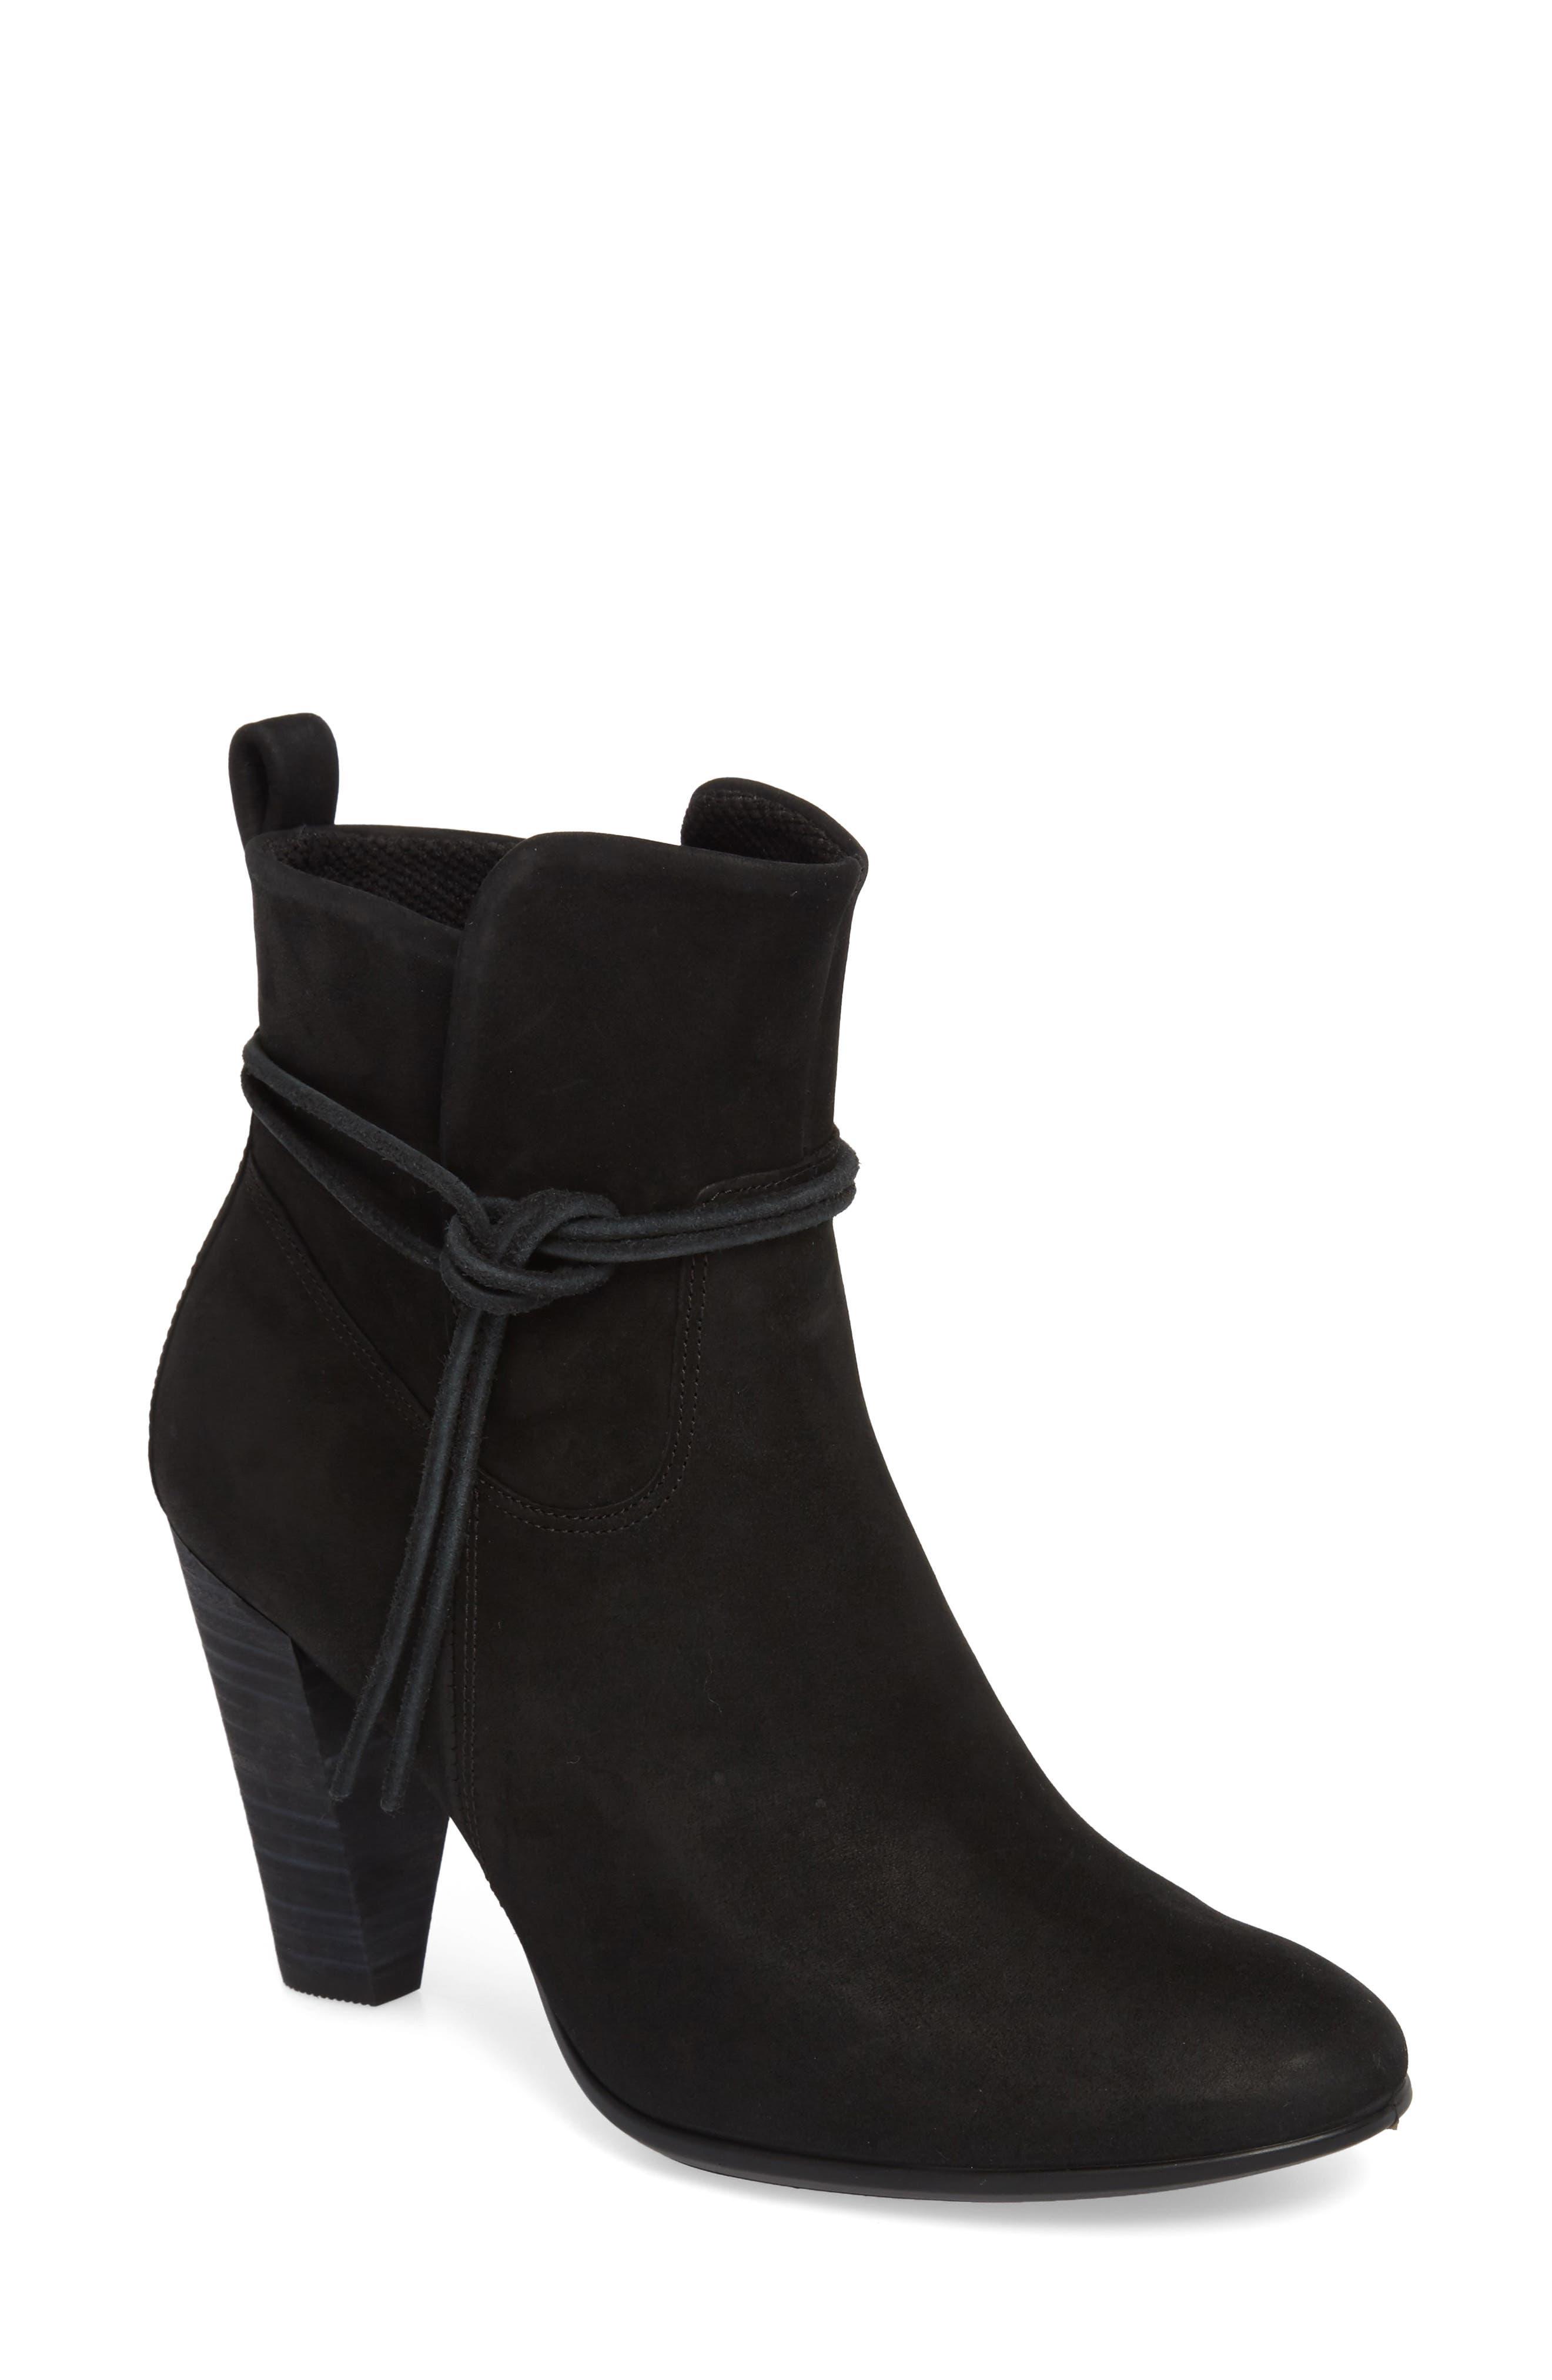 Alternate Image 1 Selected - ECCO Shape 75 Tassel Boot (Women)